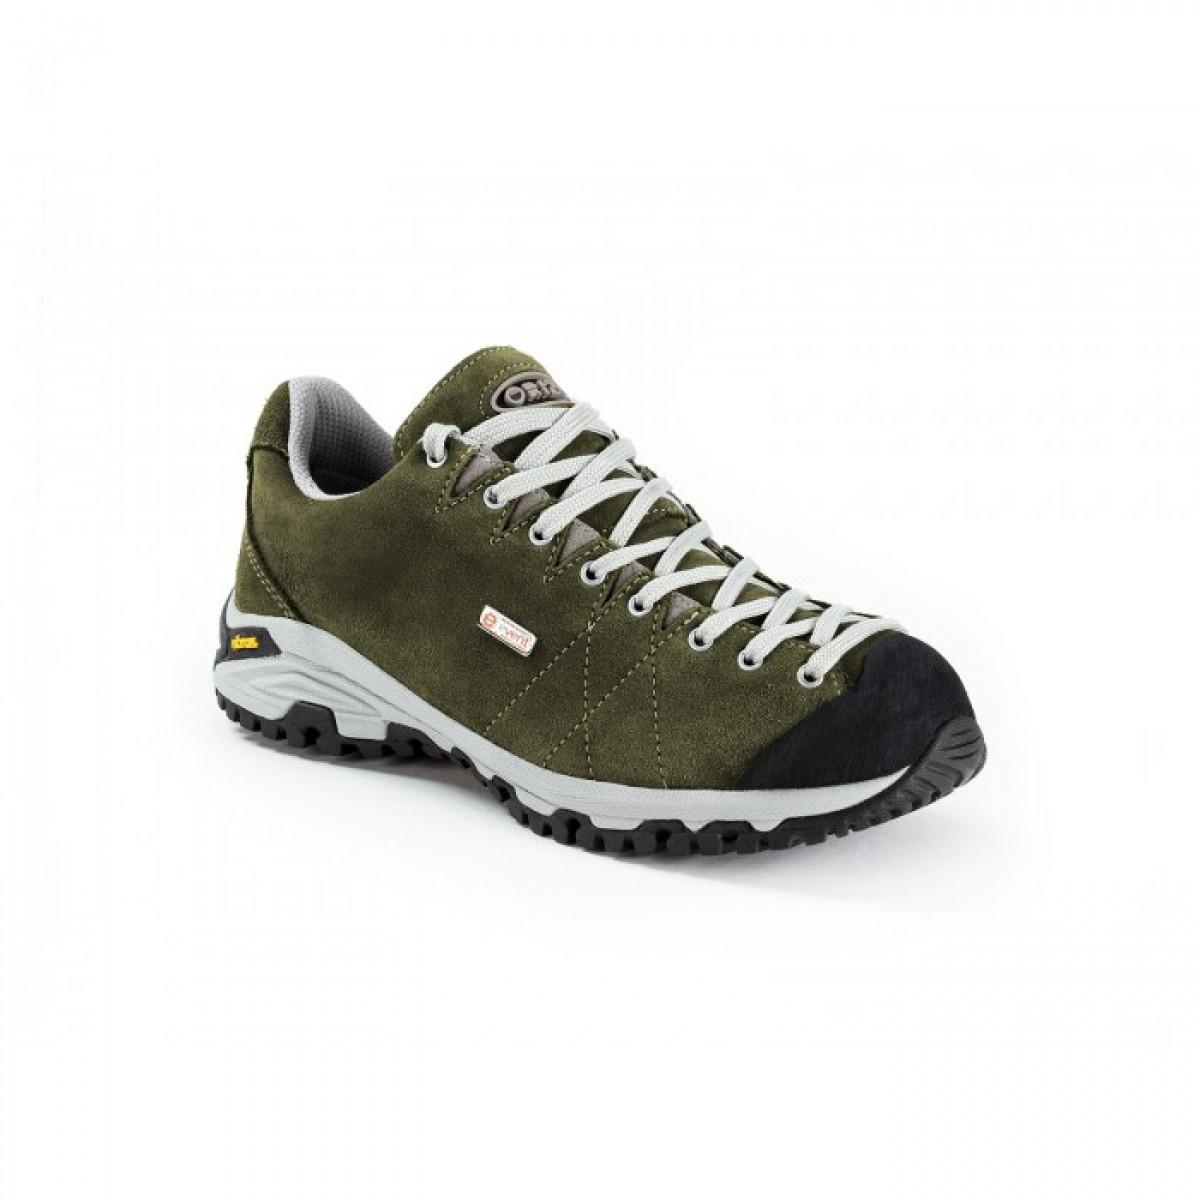 Poľovnícka obuv Orizo 106 Andrew  44